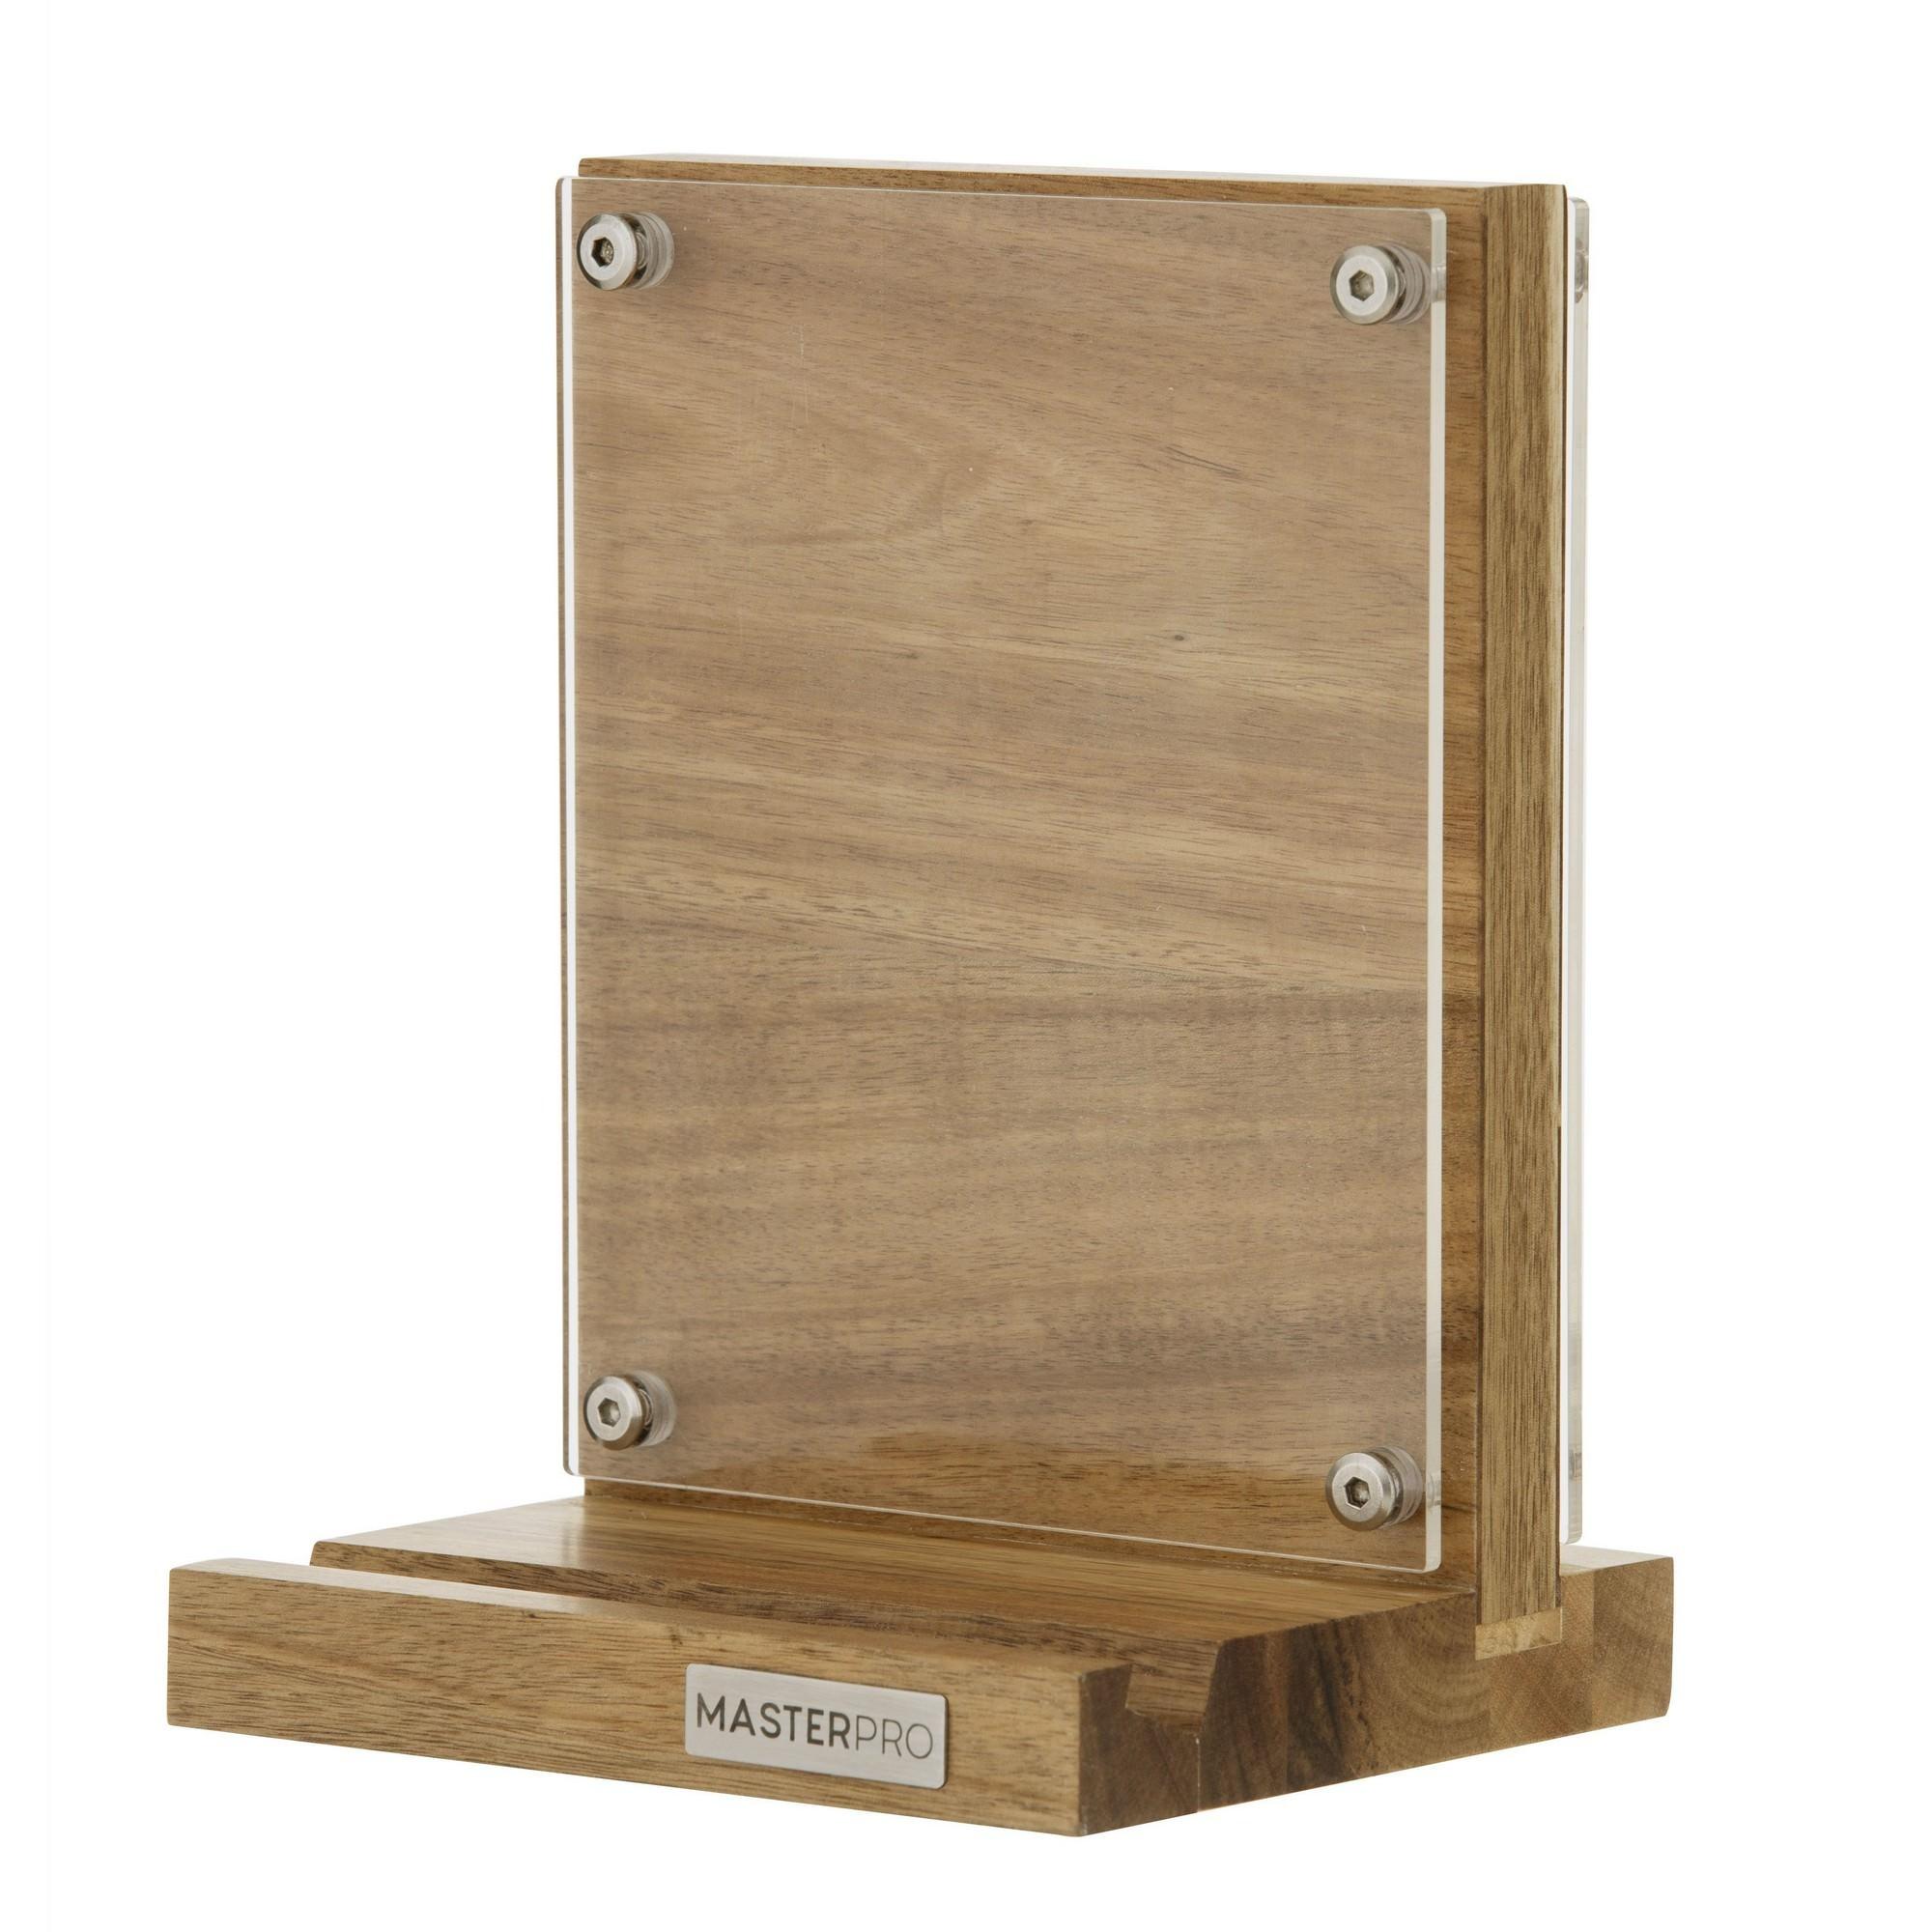 Masterpro Acacia Timber Magnetic Knife Block & Recipe Holder